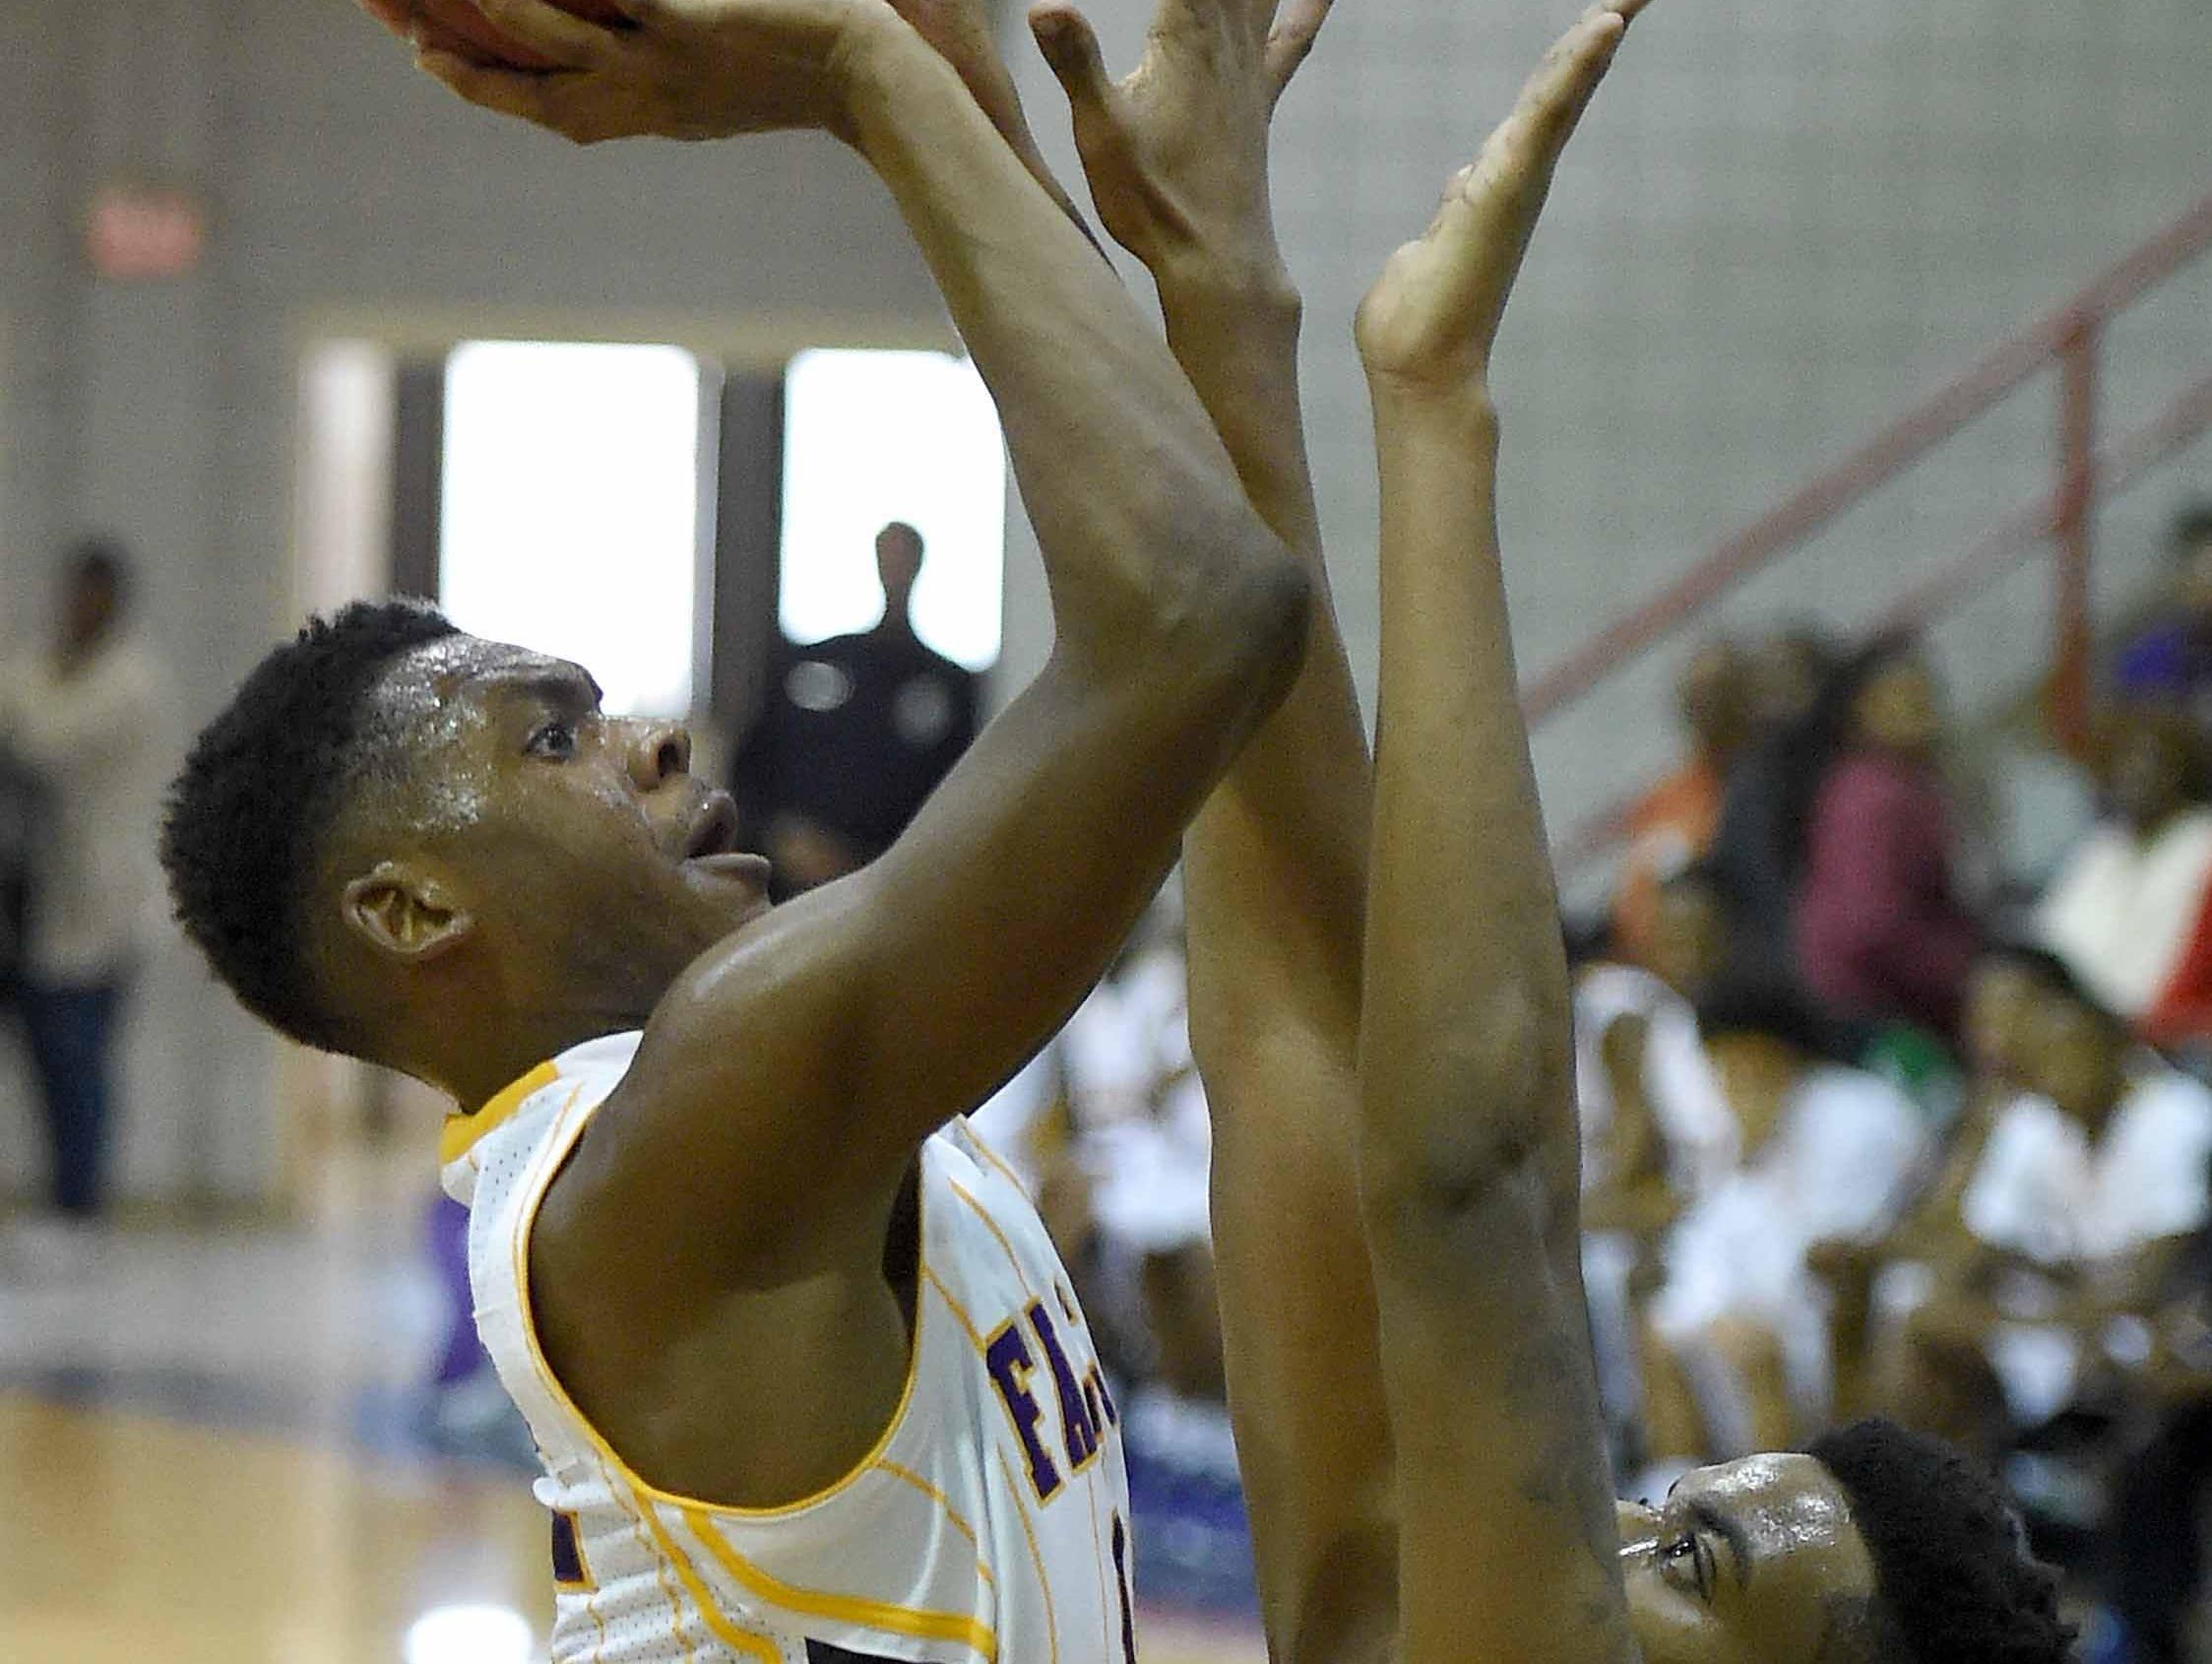 Columbus Falcon sophomore Robert Woodard, Jr. shoots over Provine's Eddie Galloway on Saturday, November 21, 2015, in the Orsmond Jordan Showcase basketball tournament at Forest Hill High School in Jackson, Miss.